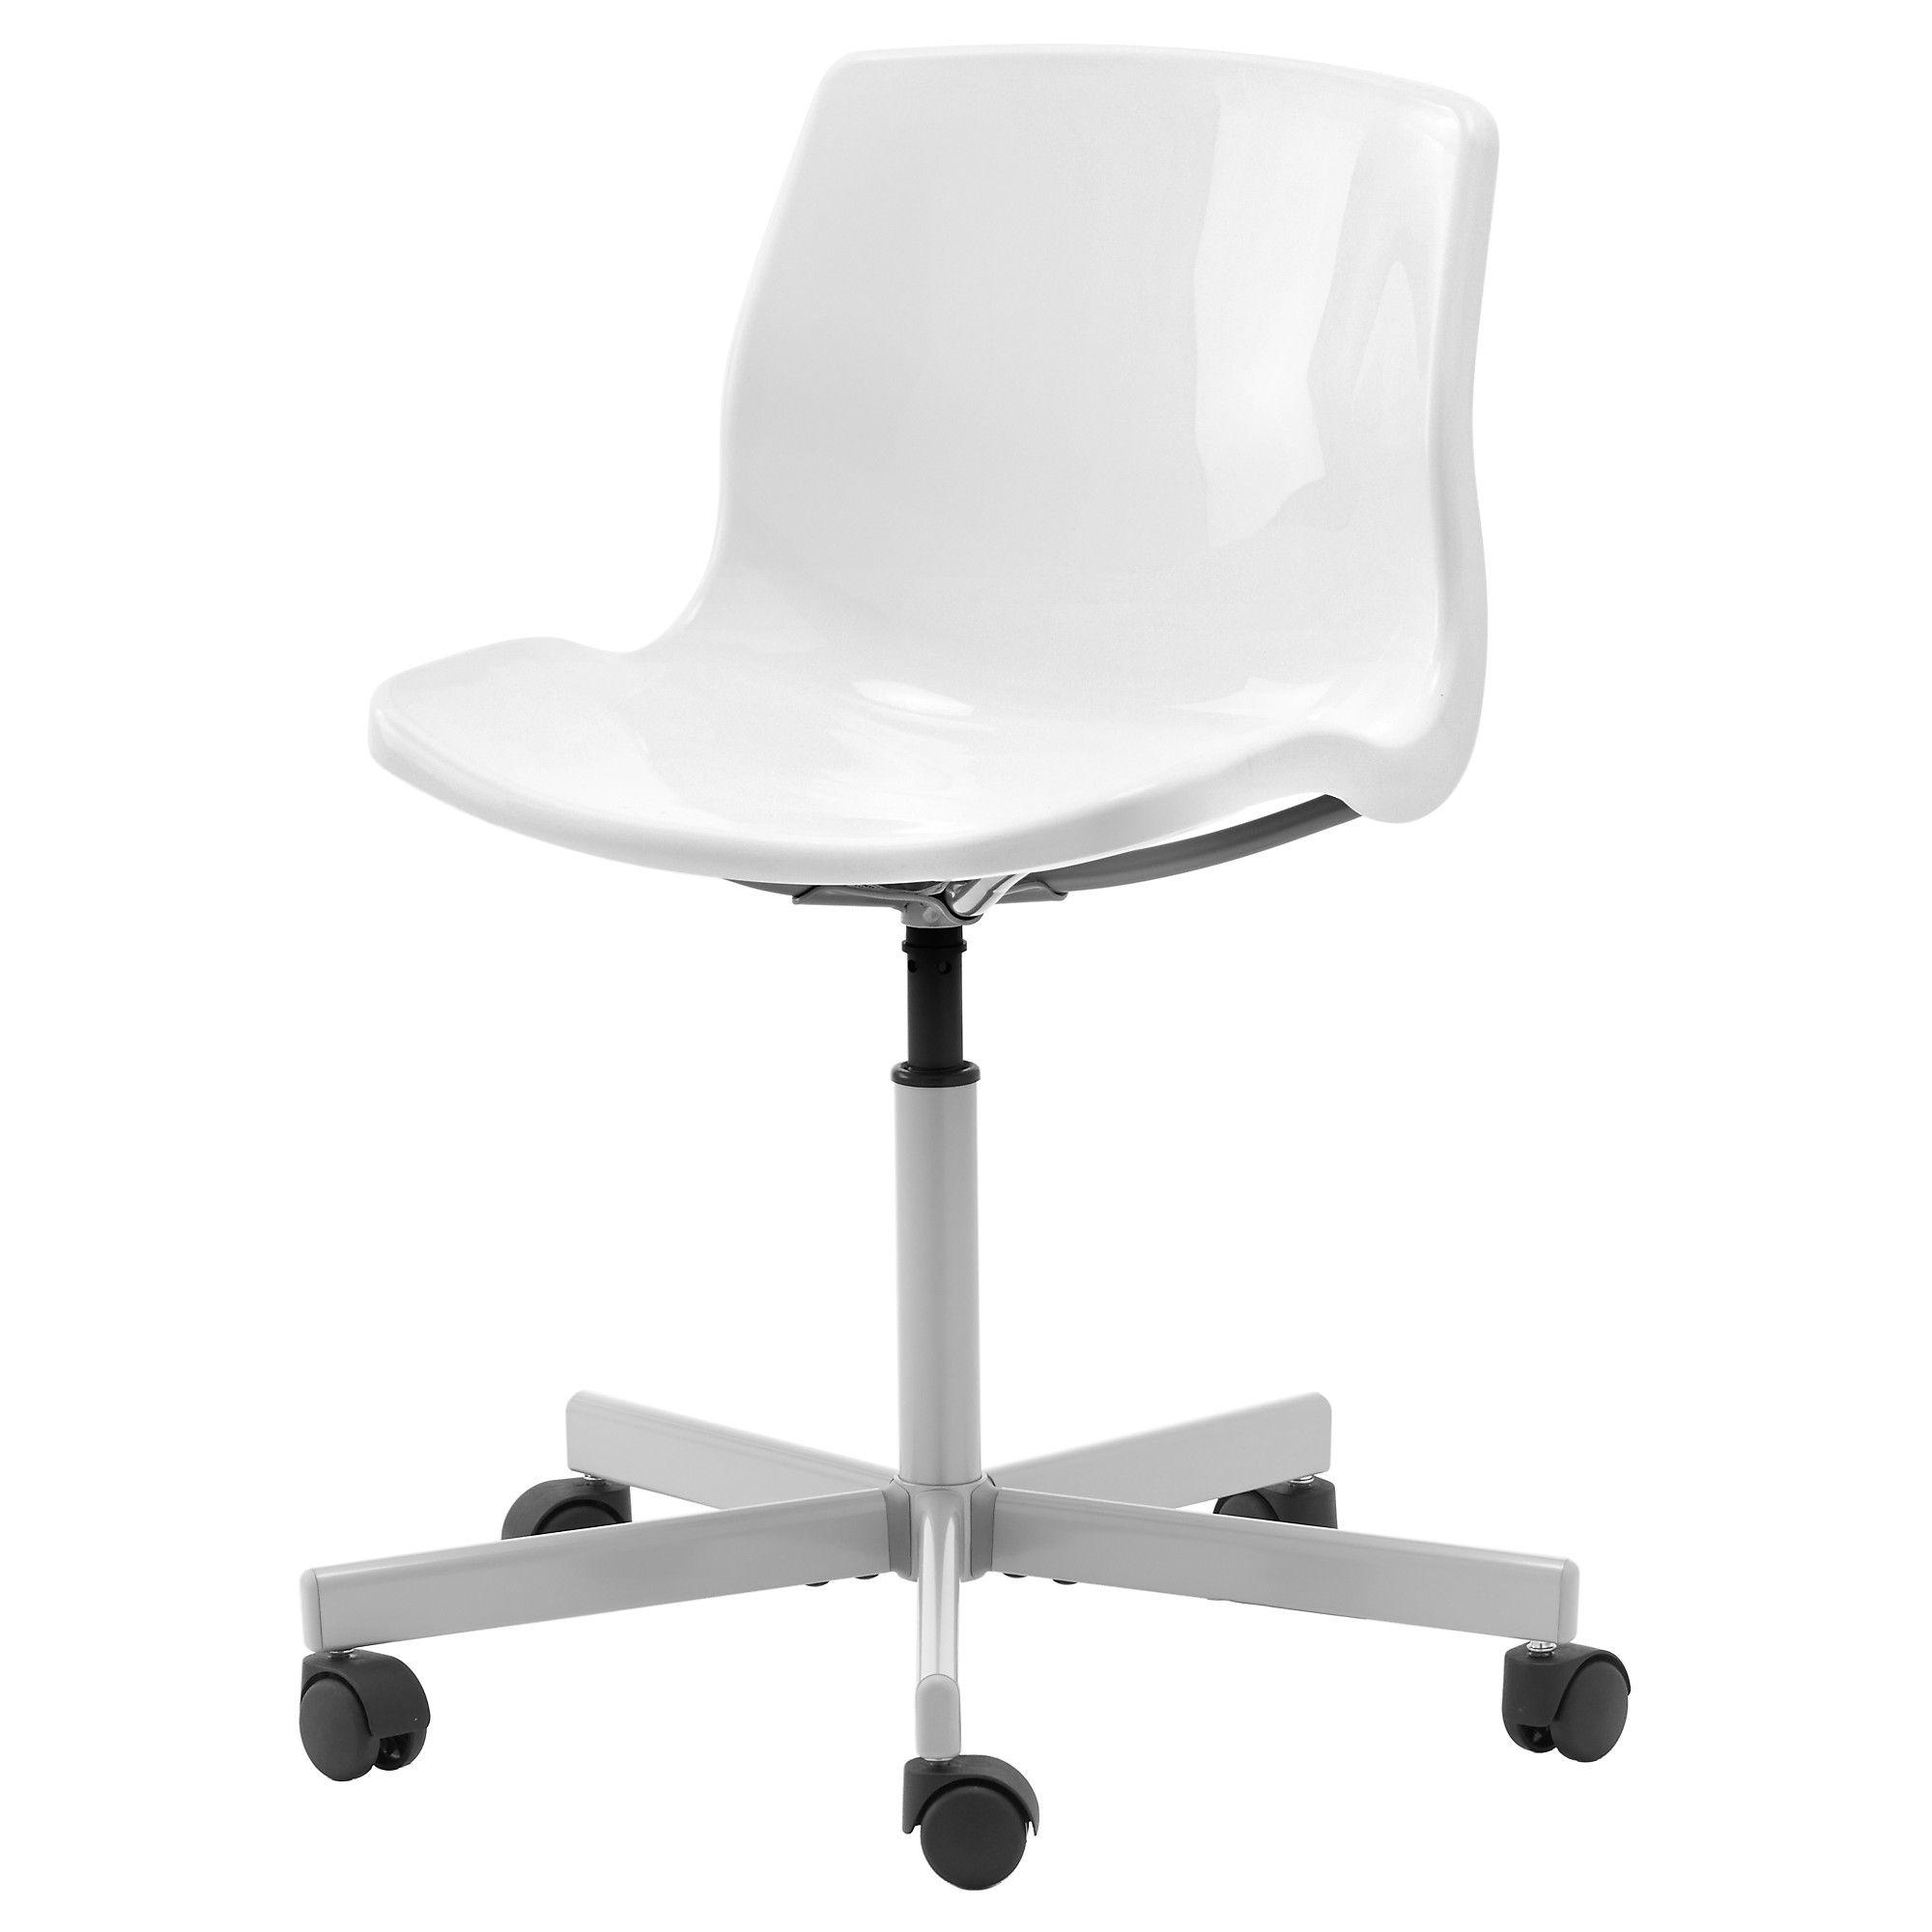 snille swivel chair ikea 20 home office bureau pas cher ikea desk chairs